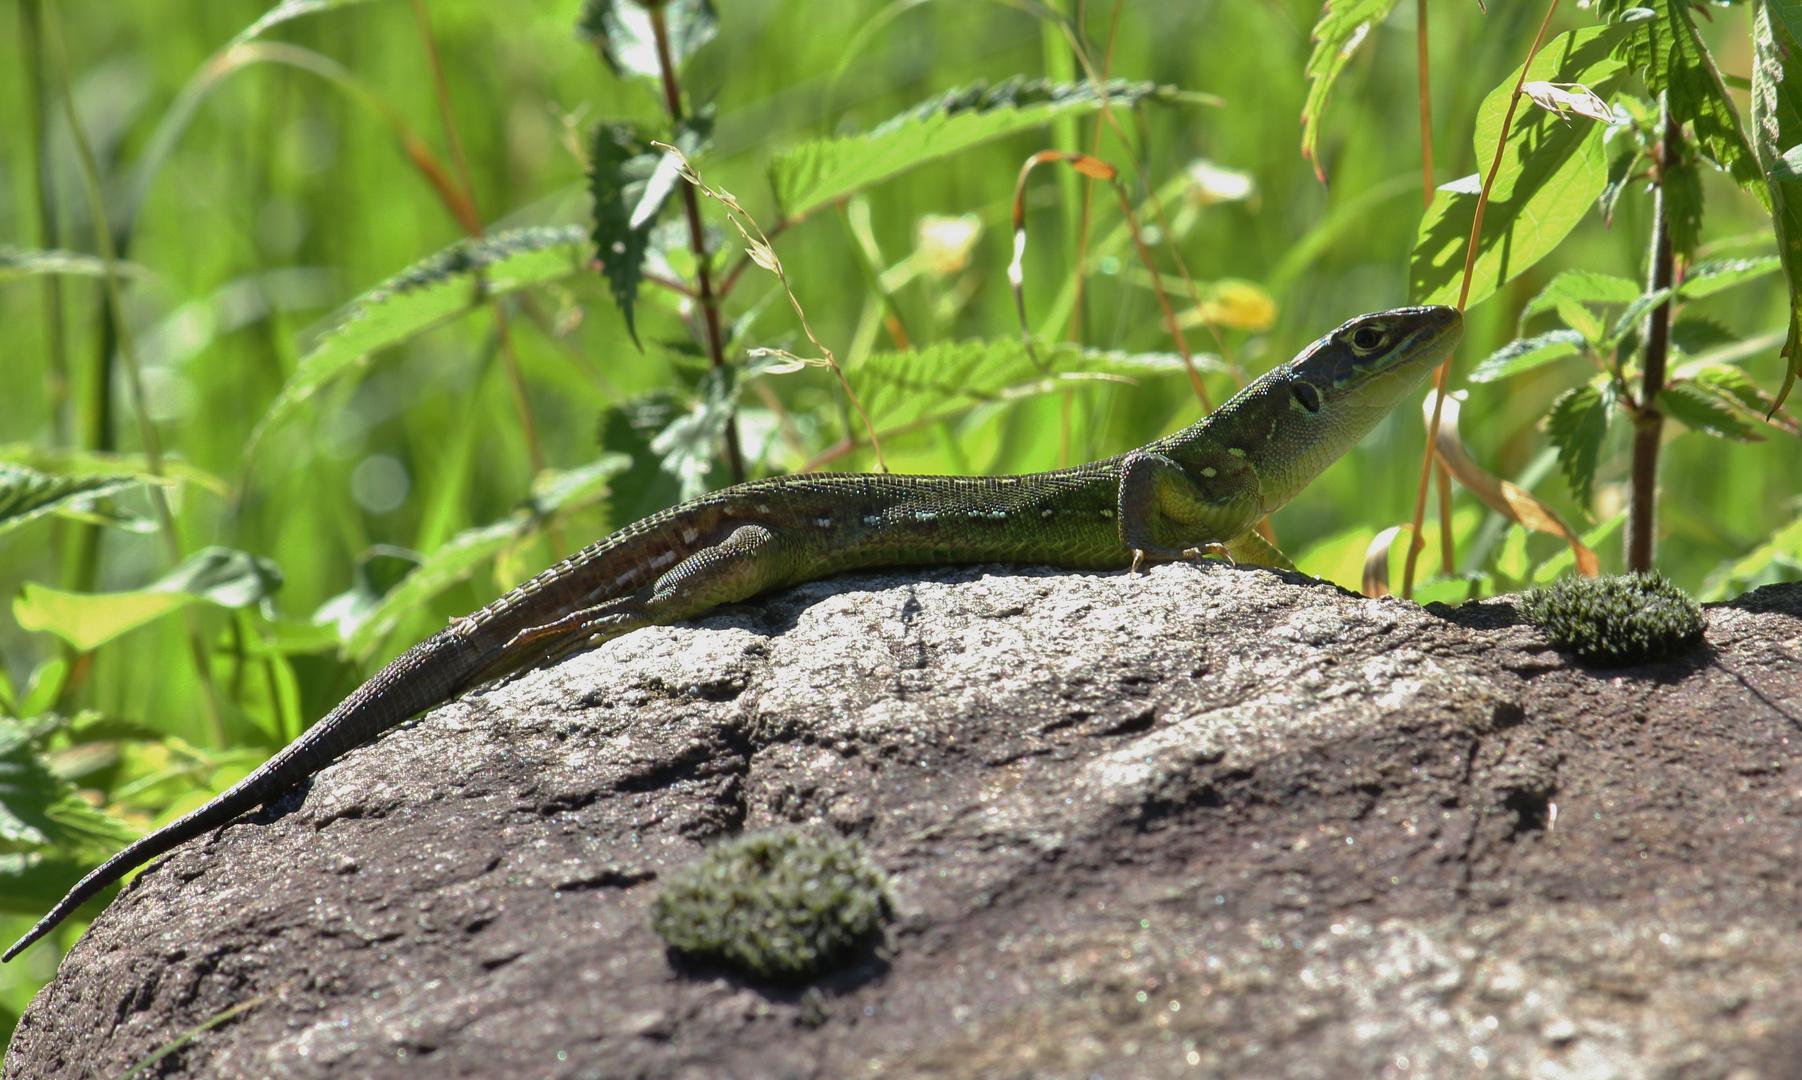 Juvenile Smaragdeidechse (Lacerta bilineata)